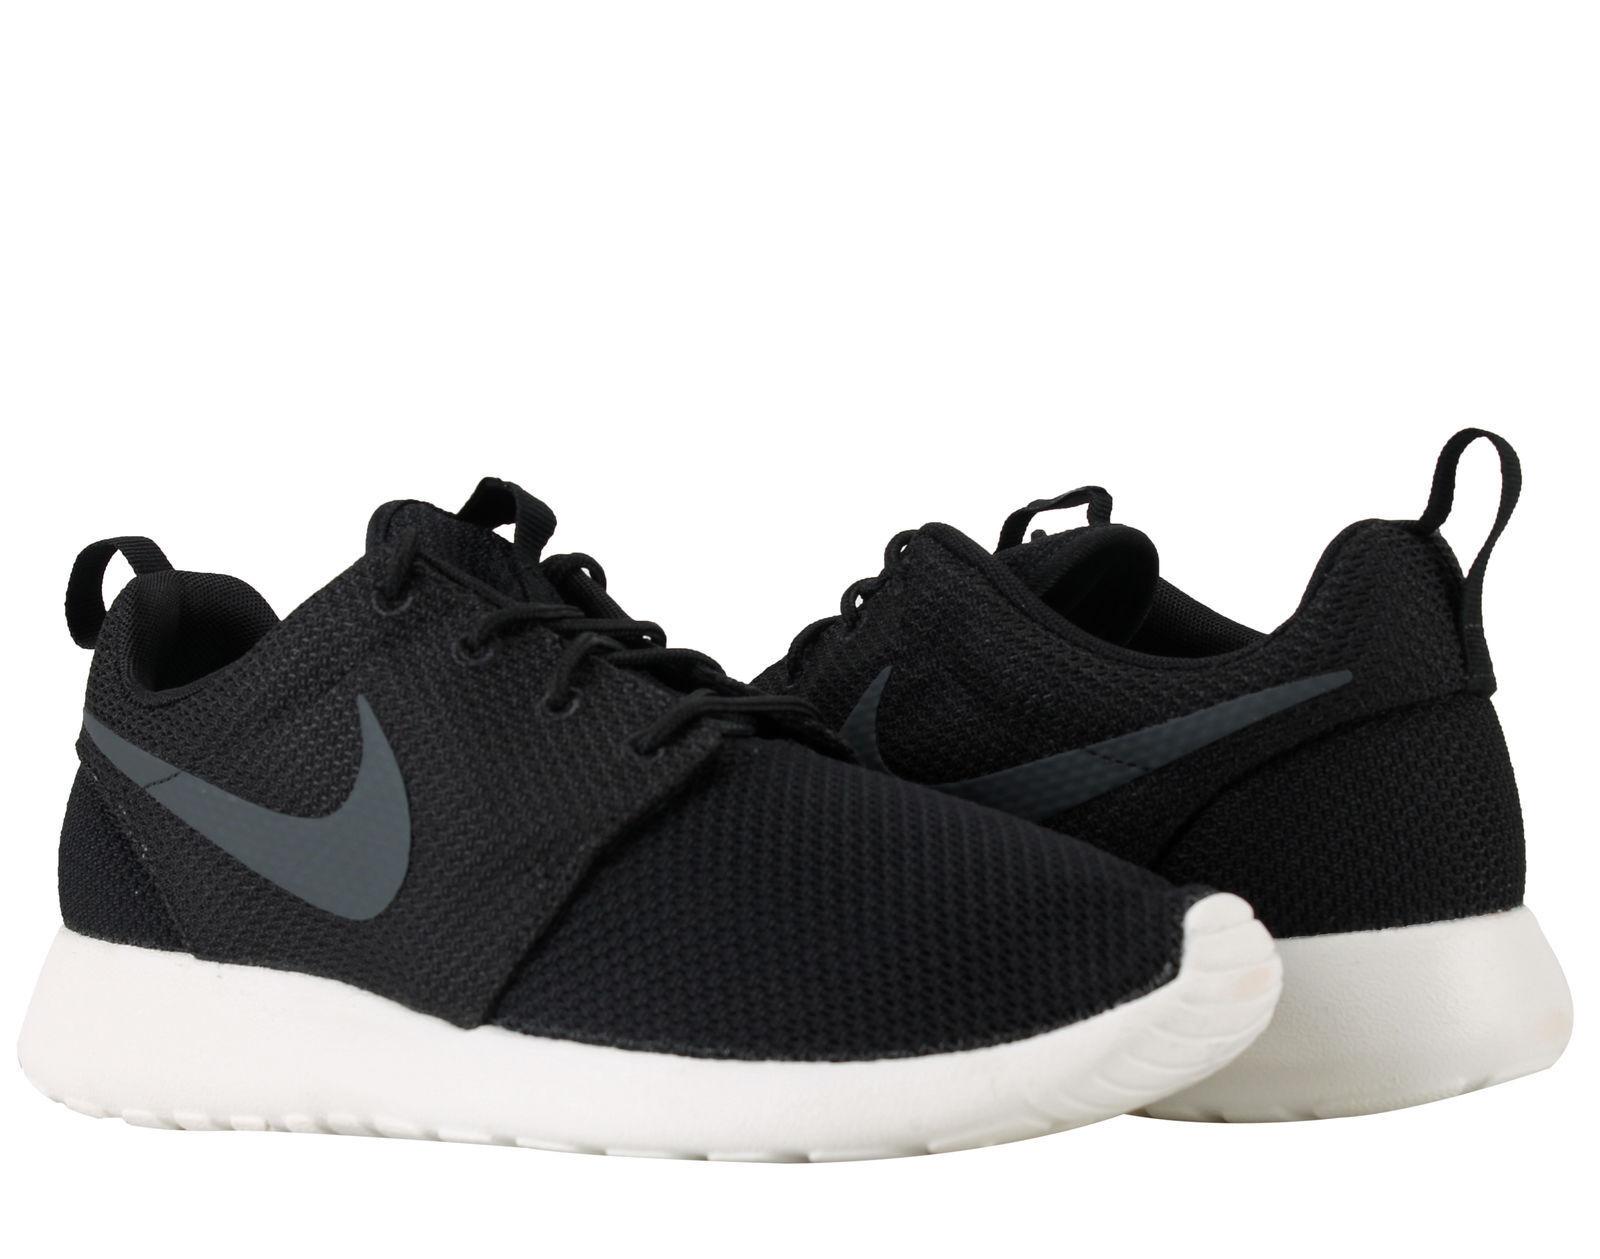 Men's Nike Roshe One Black Anthracite-Sail Sizes 8-12 New In Box 511881-010